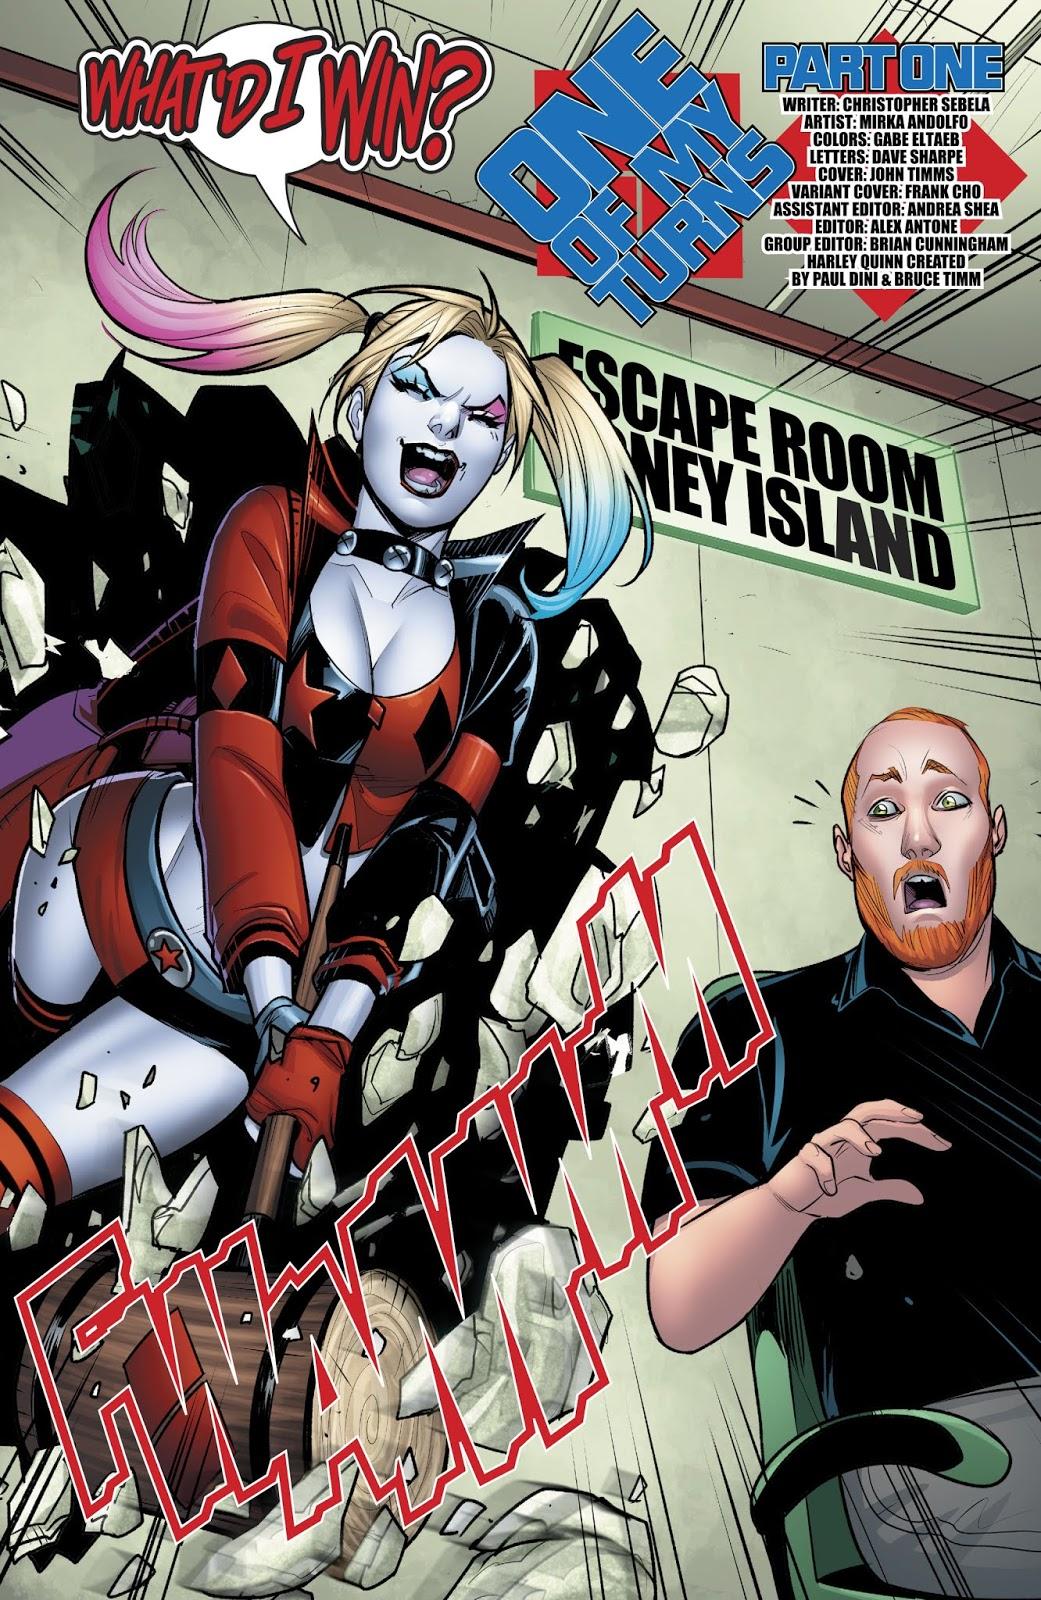 Harley Quinn Vol. 3 #43